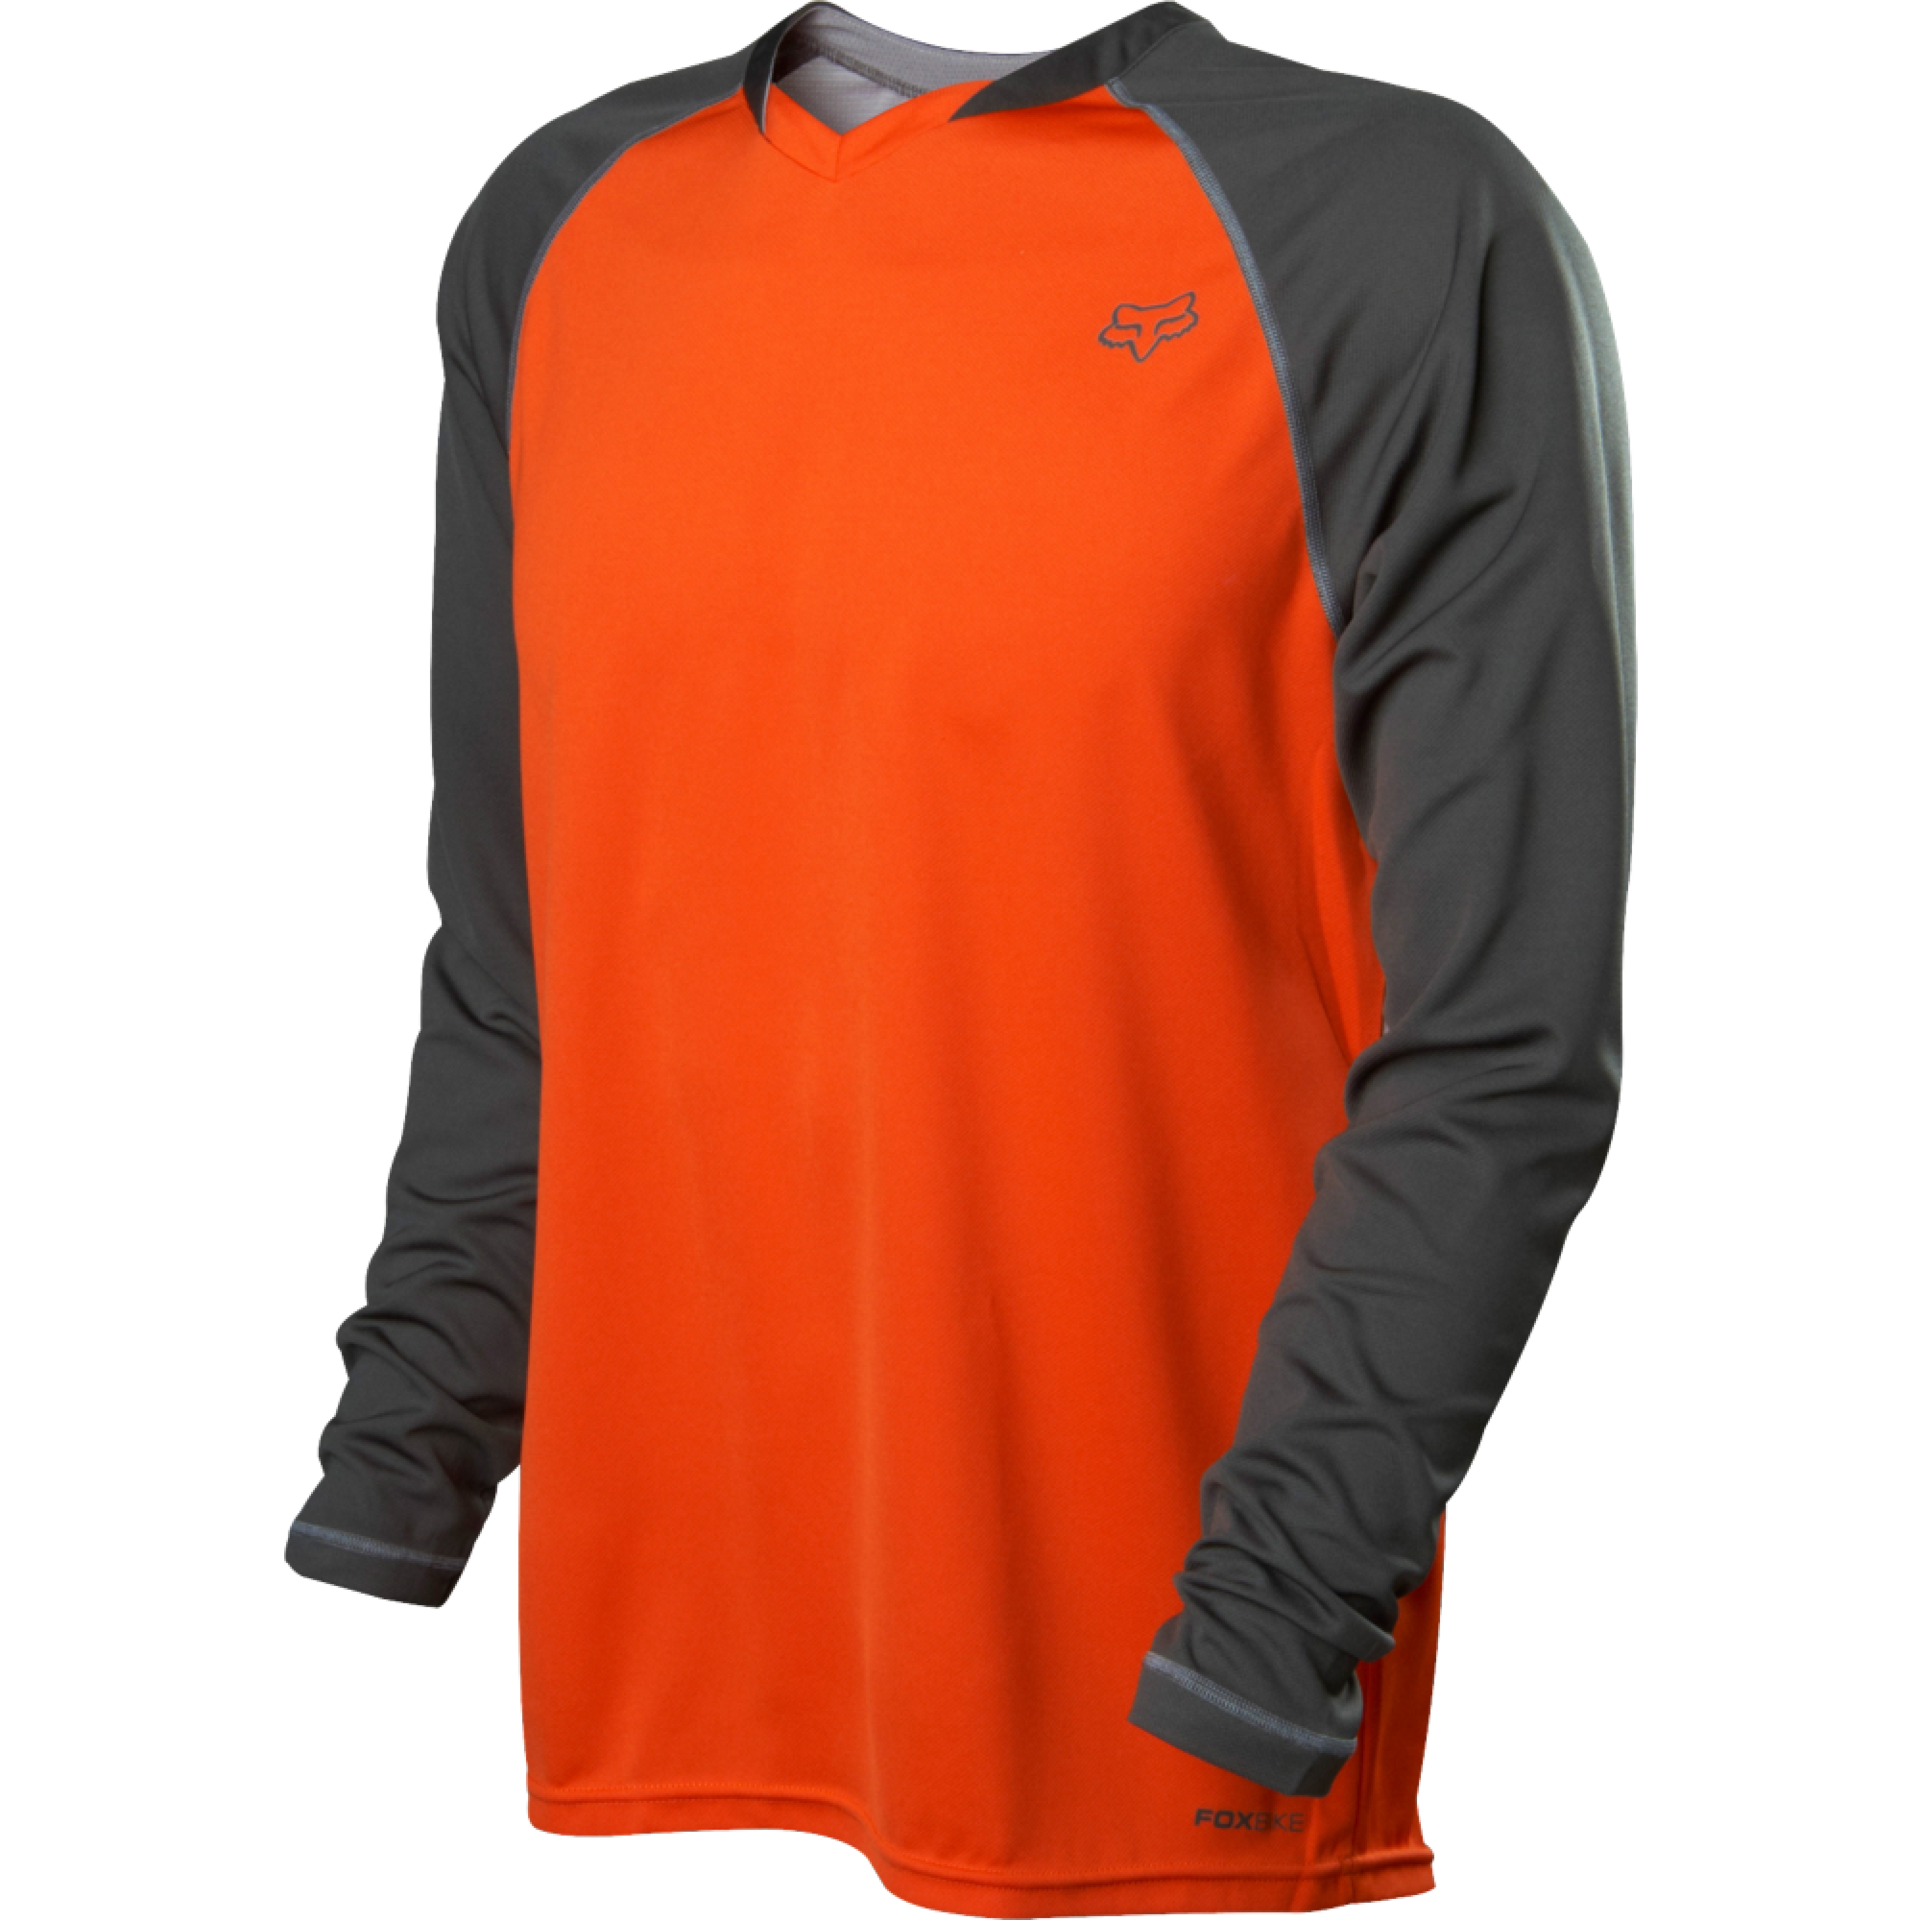 Koszulka Indicator LD Jersey pomarańczowa przód